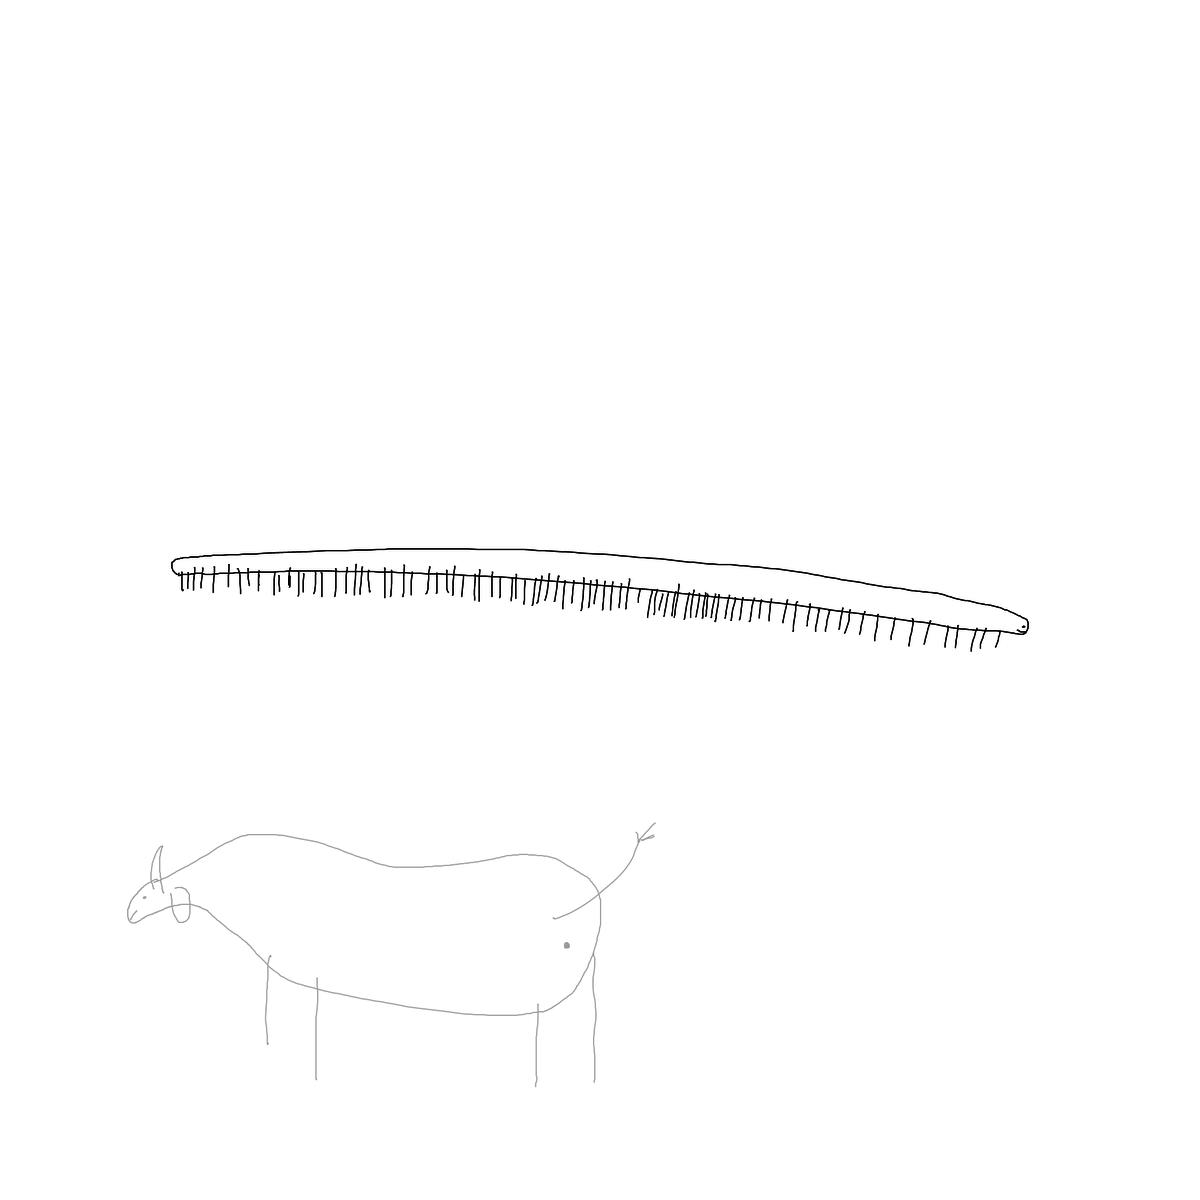 BAAAM drawing#2342 lat:52.4750099182128900lng: 13.4069557189941400